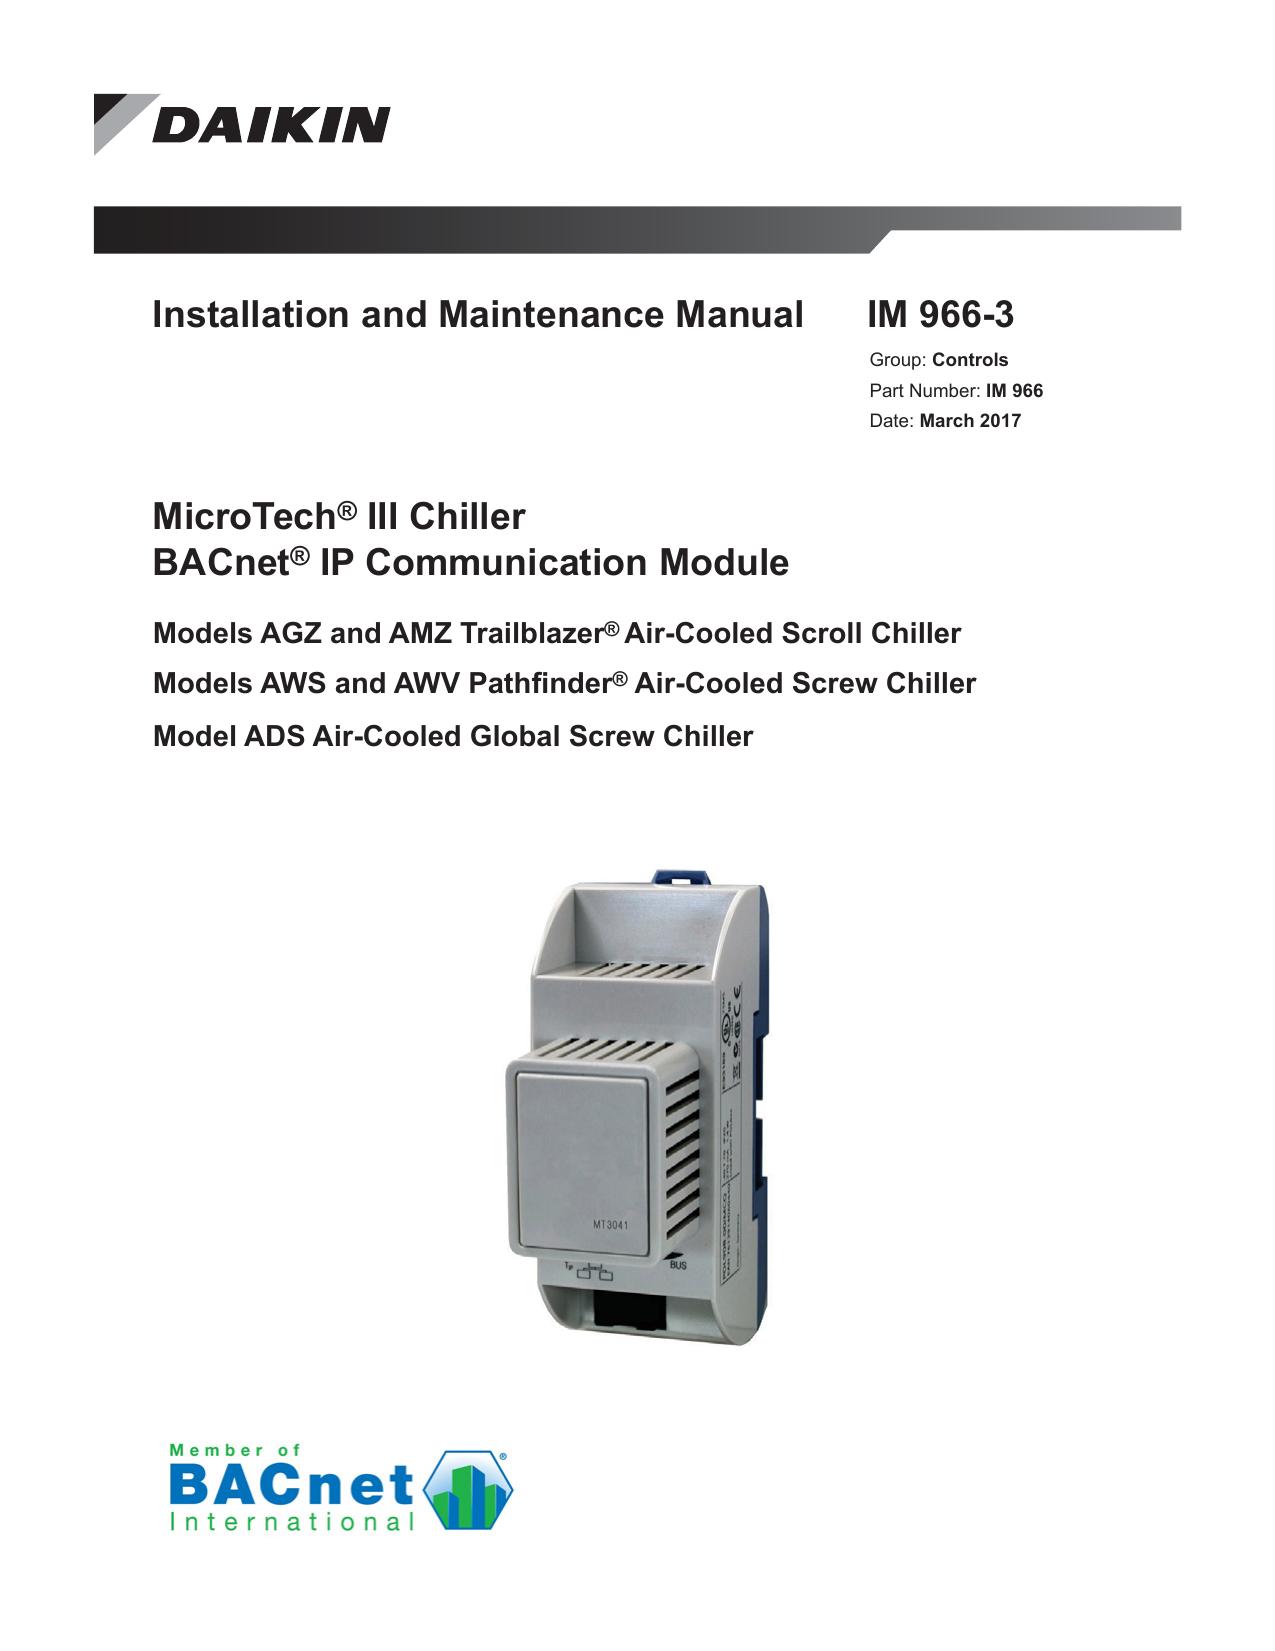 Daikin MicroTech® III Chiller BACnet® IP | manualzz.com